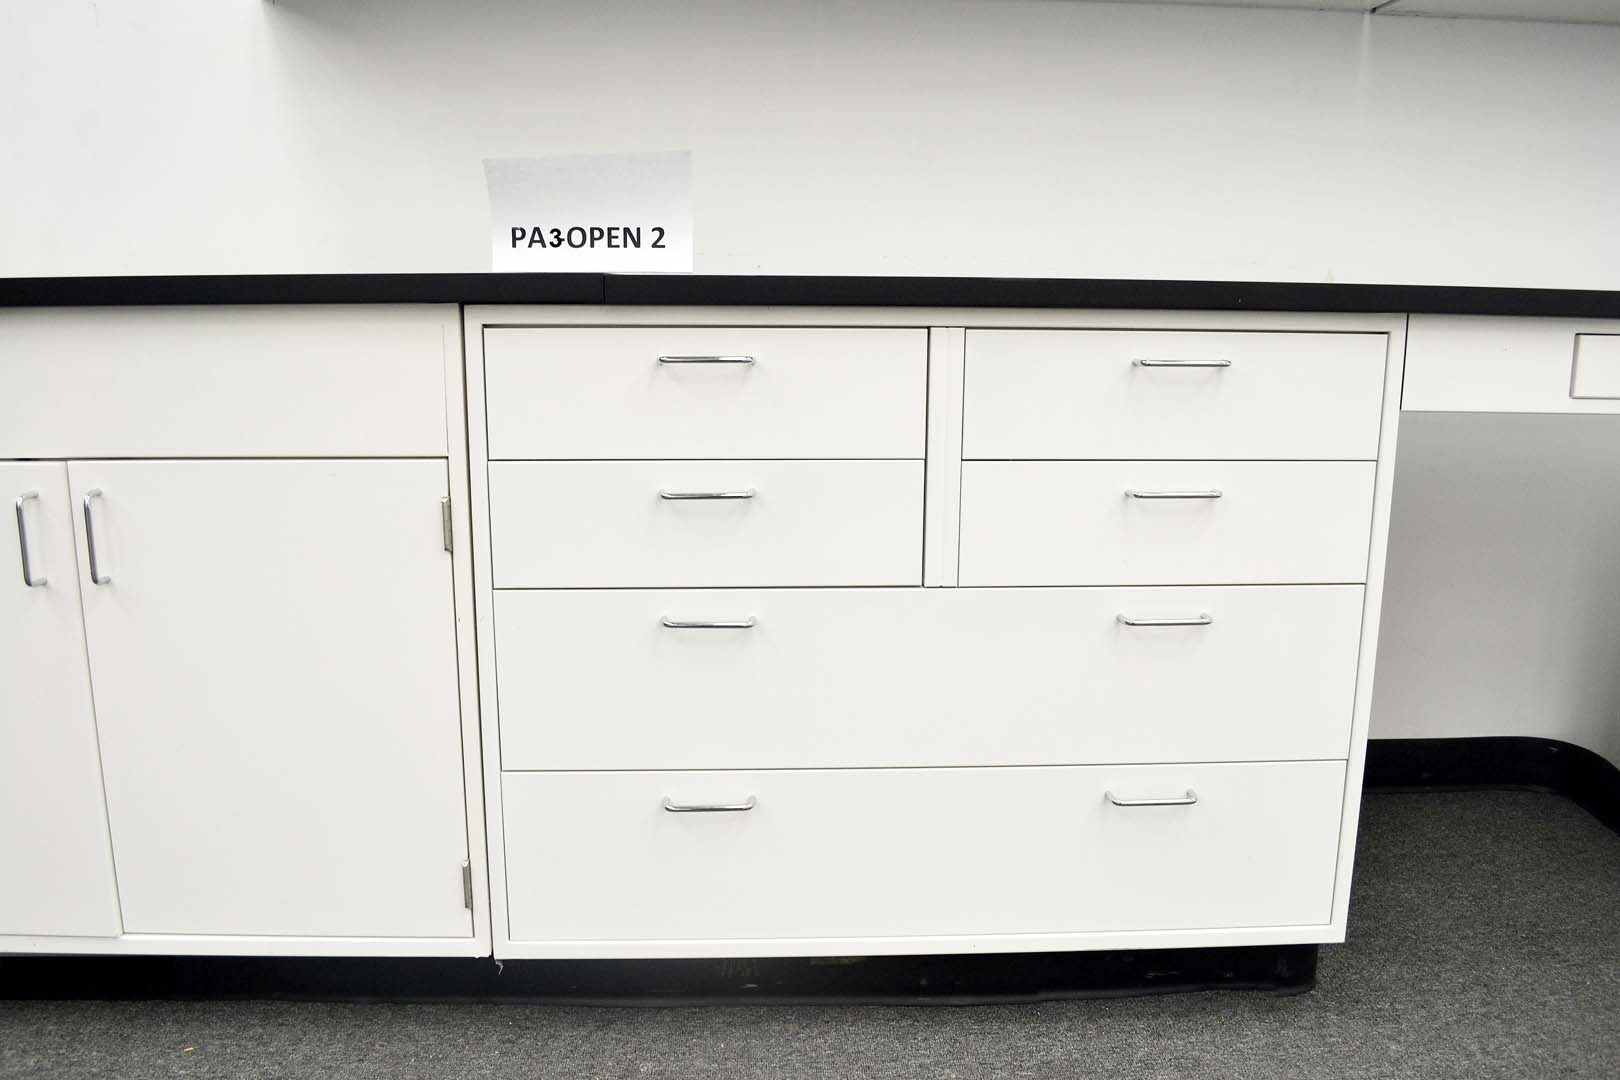 Fisher Cabinets #14 - 15u2032 Base Fisher American Laboratory Cabinets U0026 9u2032 Wall Cabinets (PA3-OPEN 2)